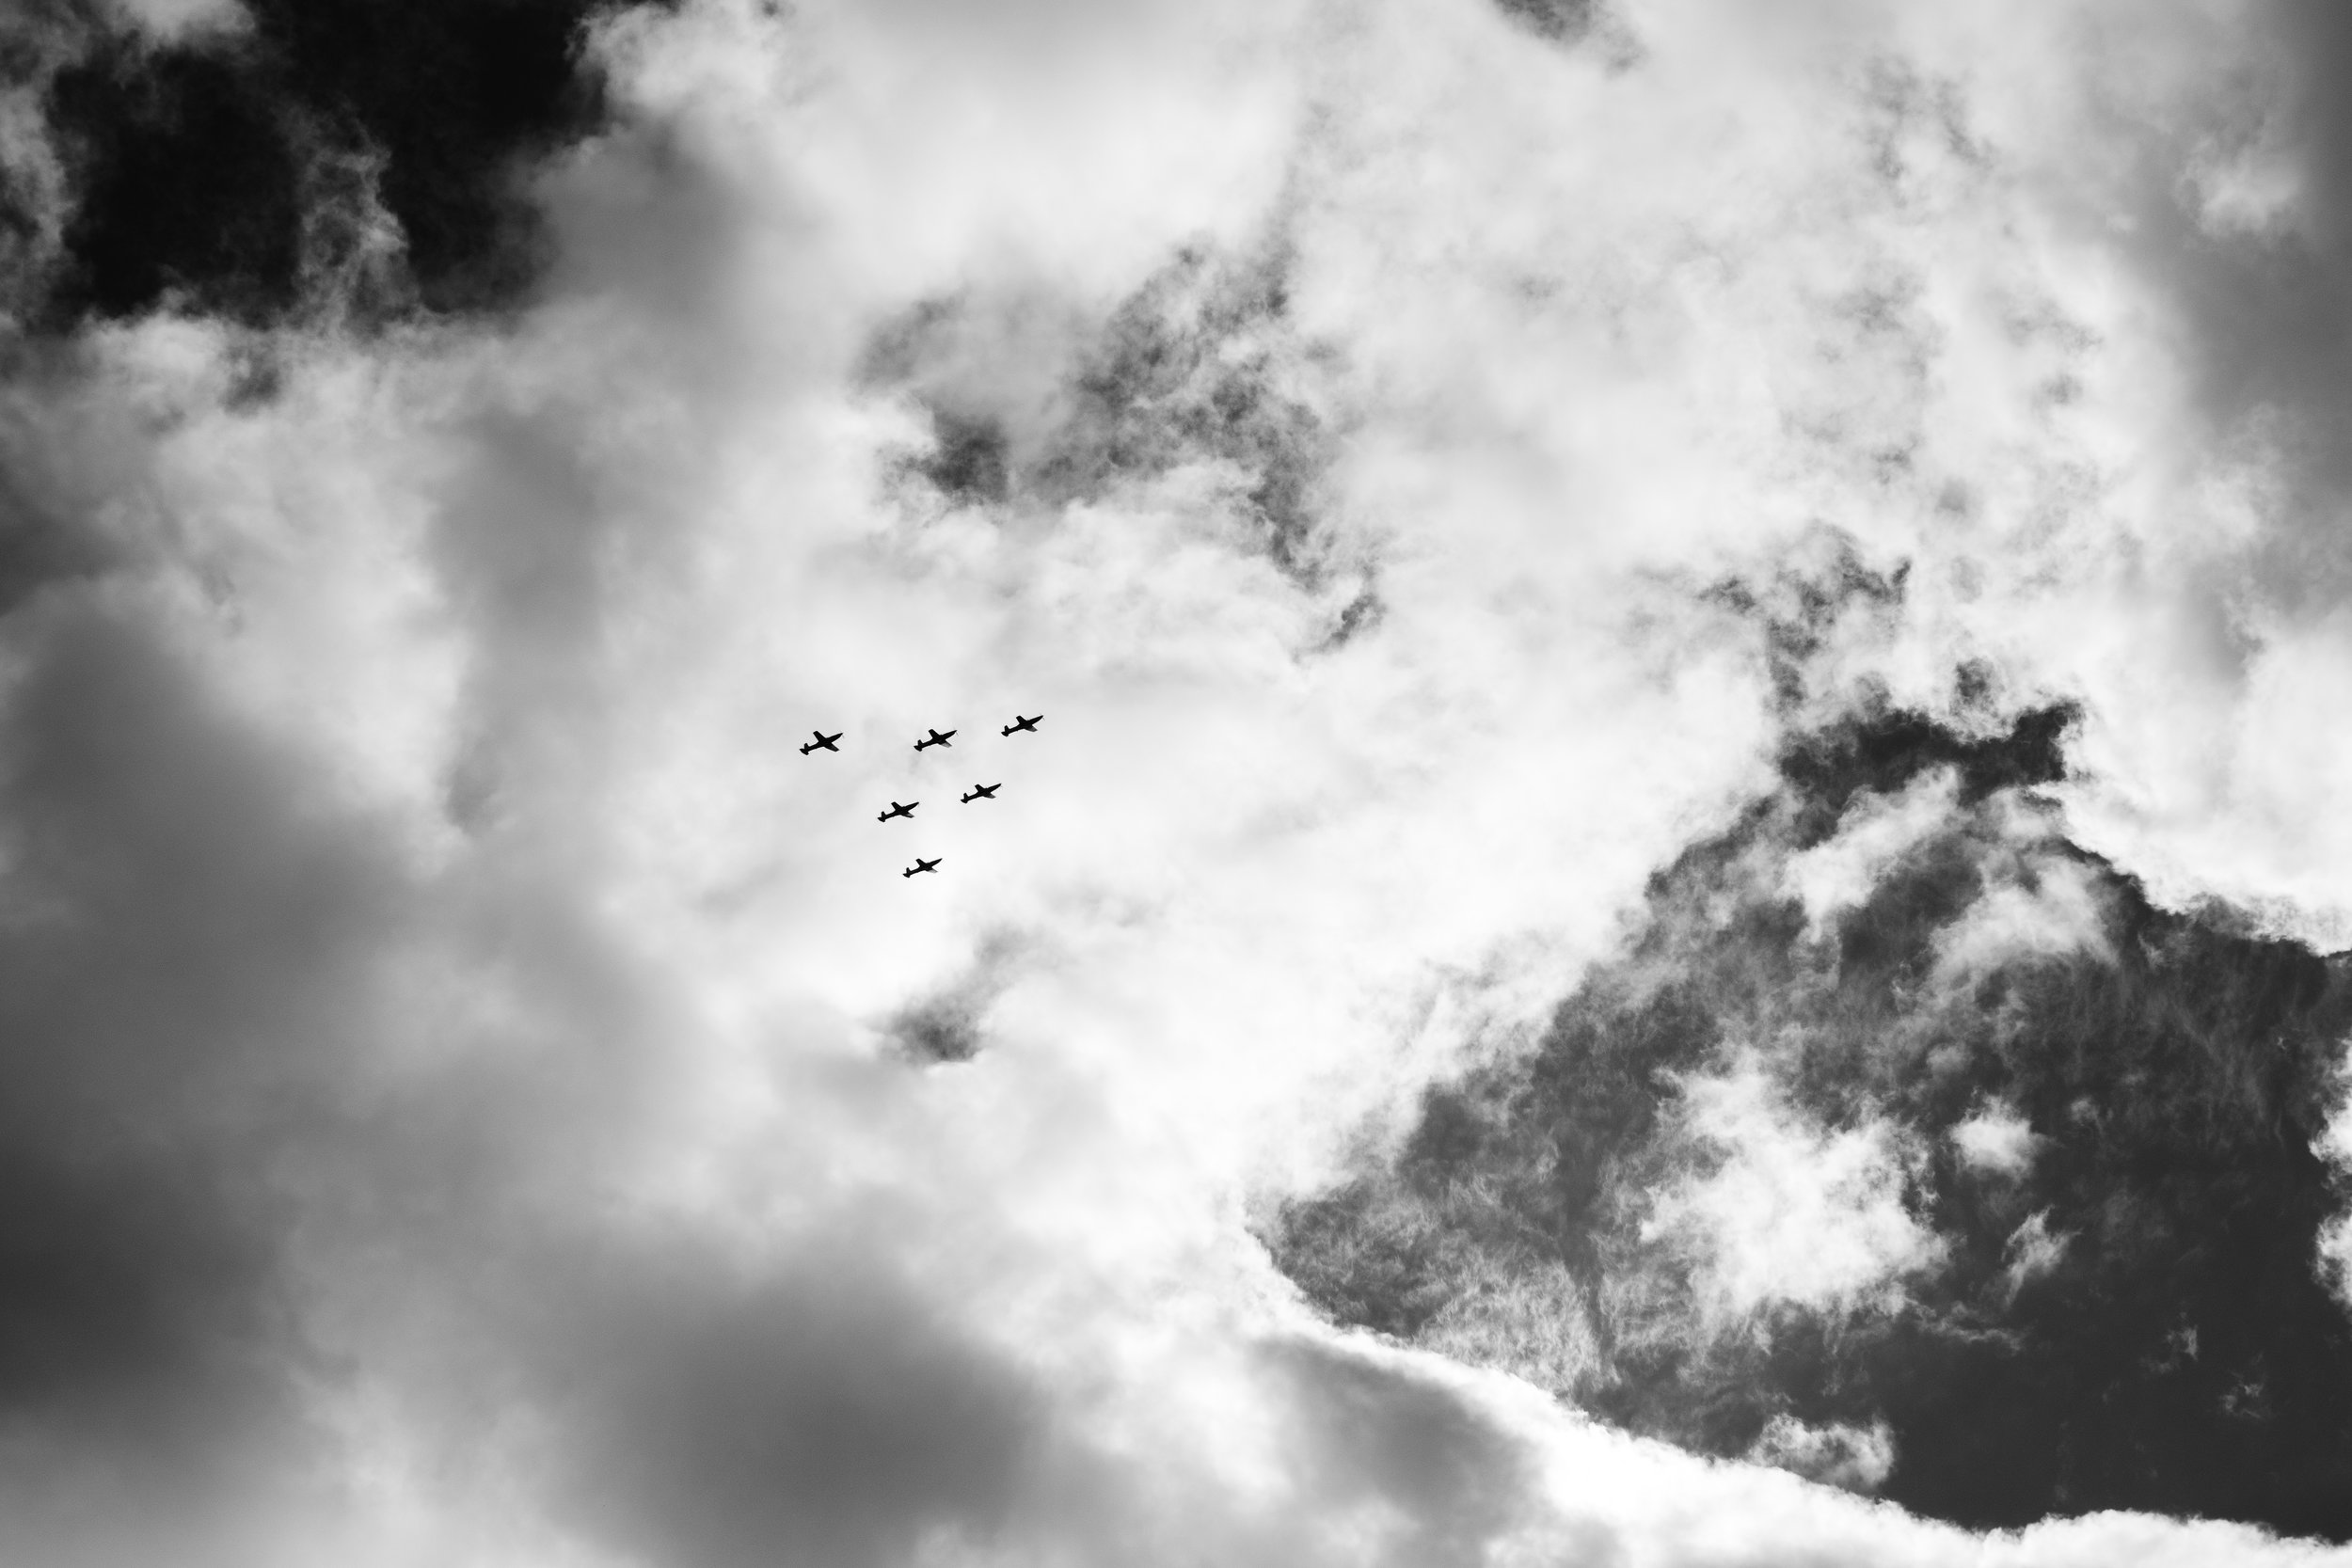 2013-09-13 - Hobart - Sandy Bay - Airforce Roulettes - untitled-7138-Edit.jpg